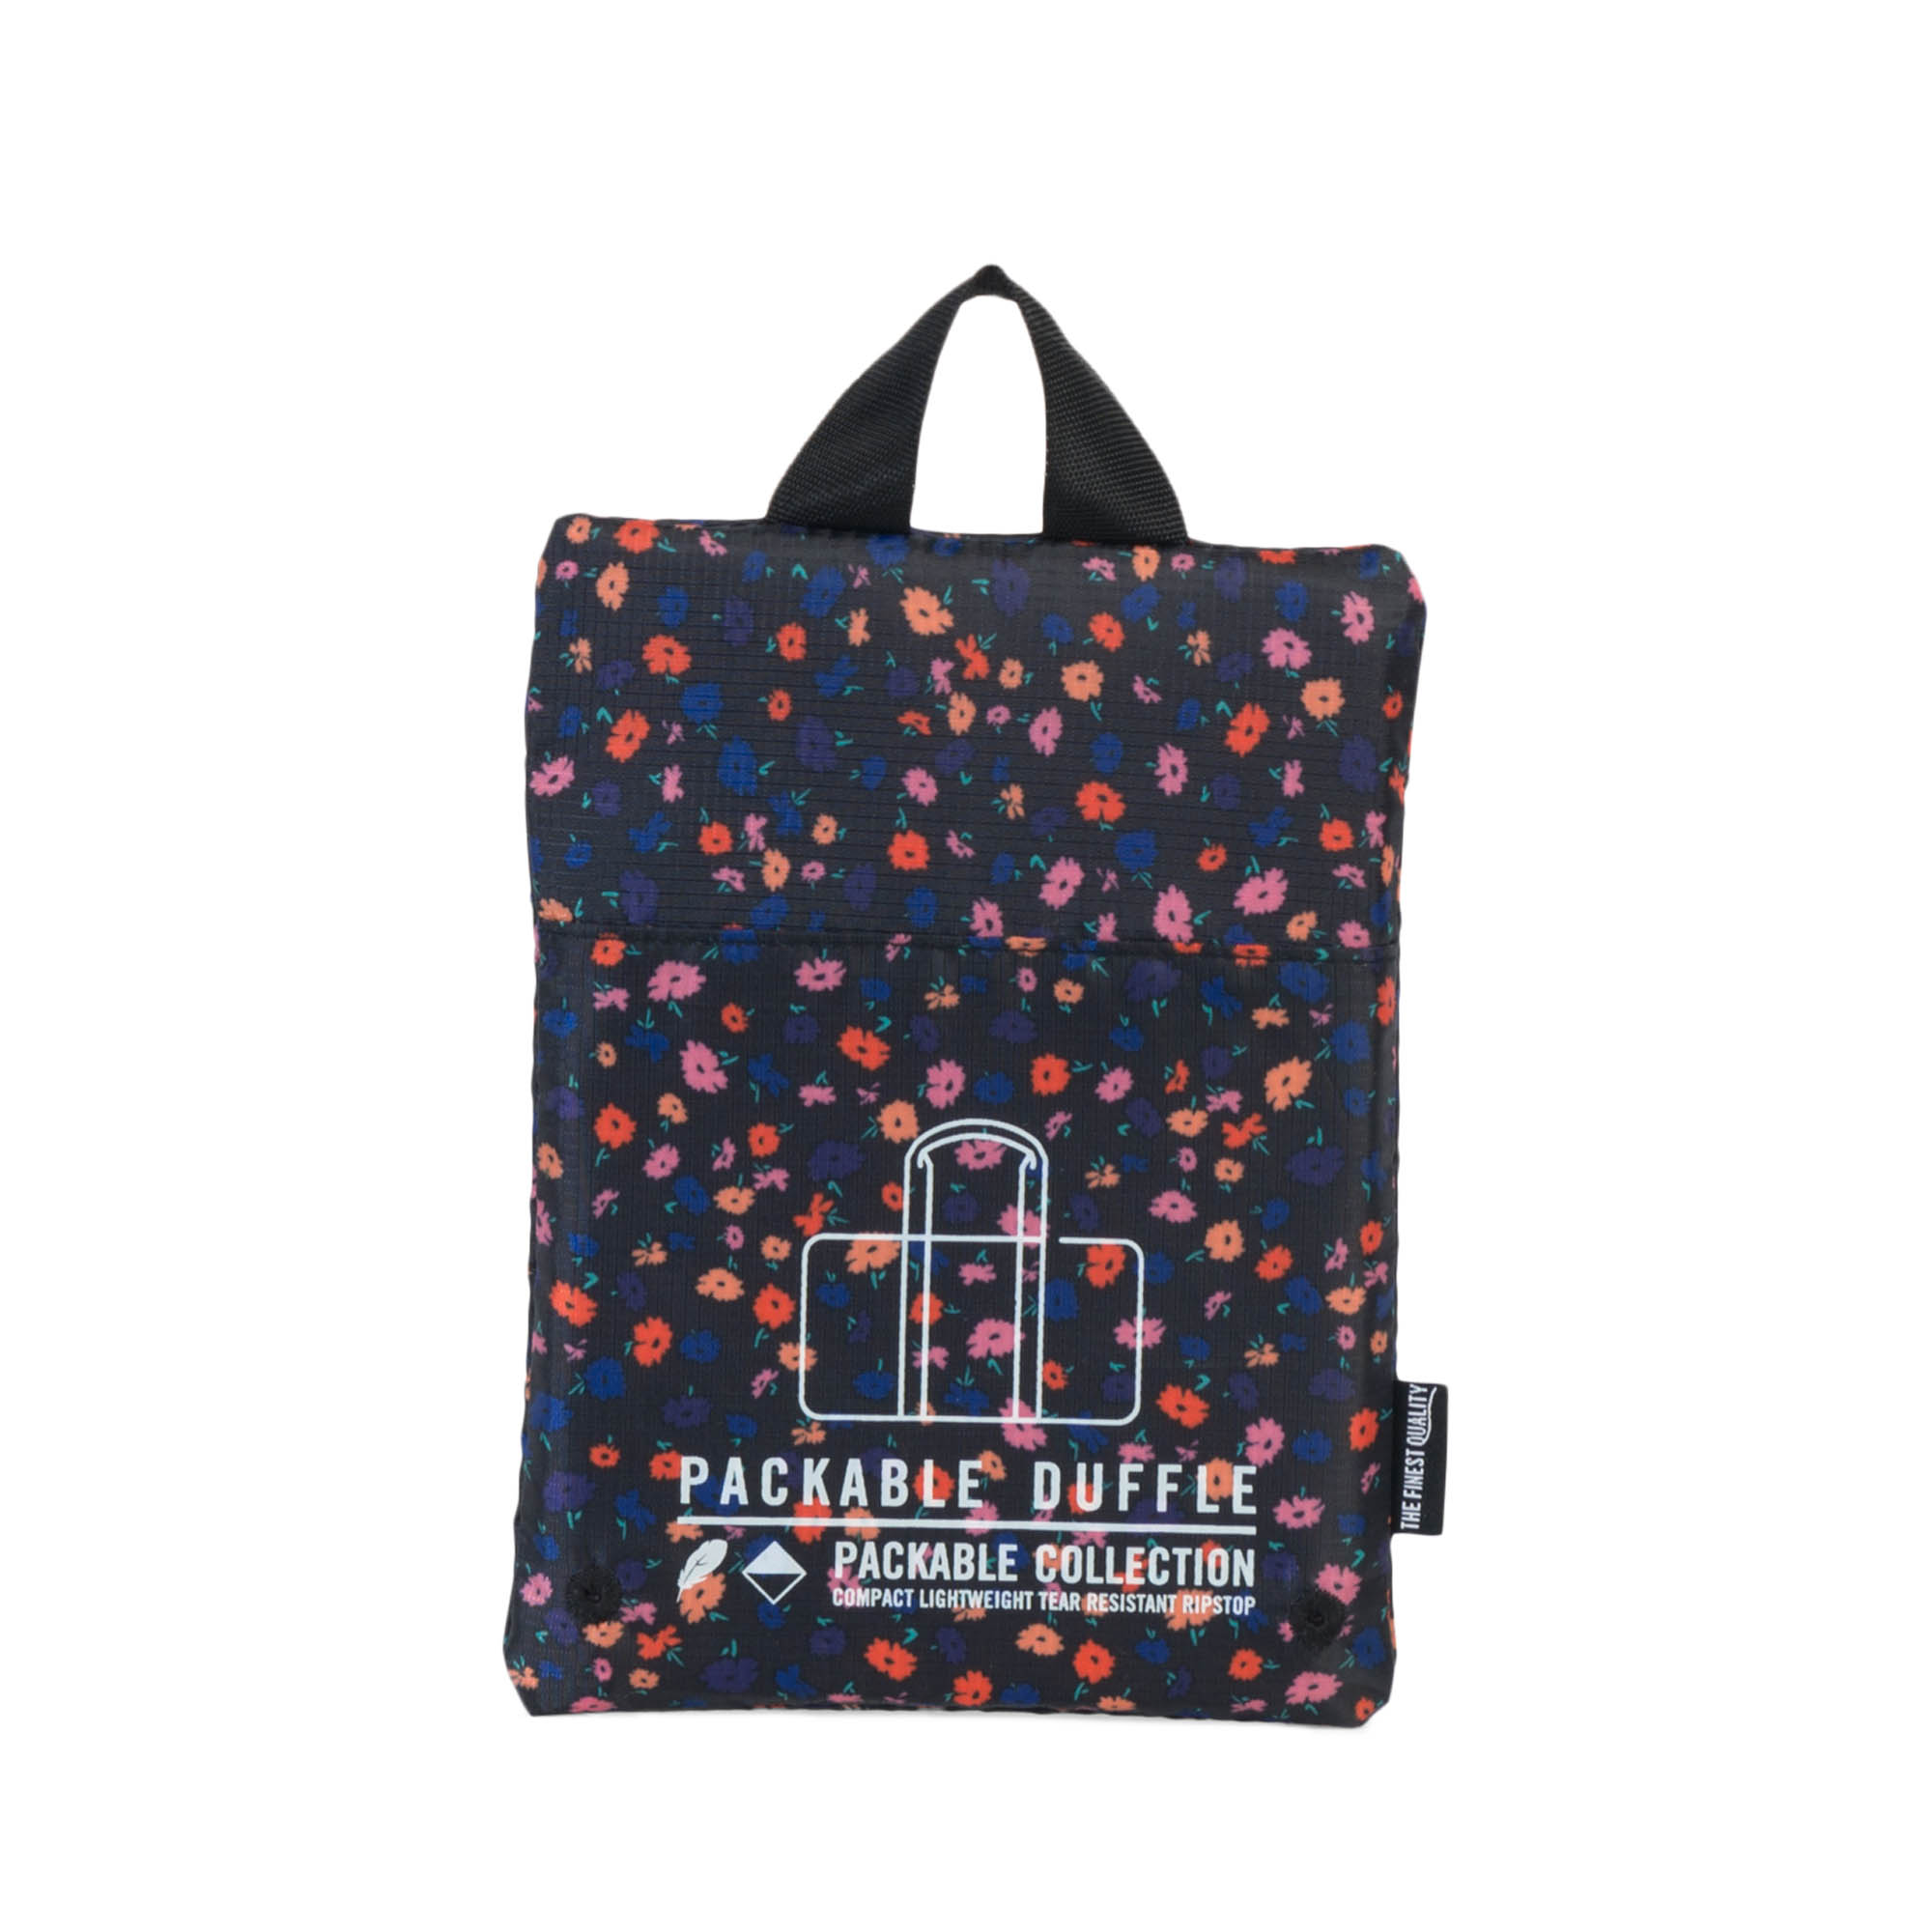 Packable Duffle  d0faaa2425f78